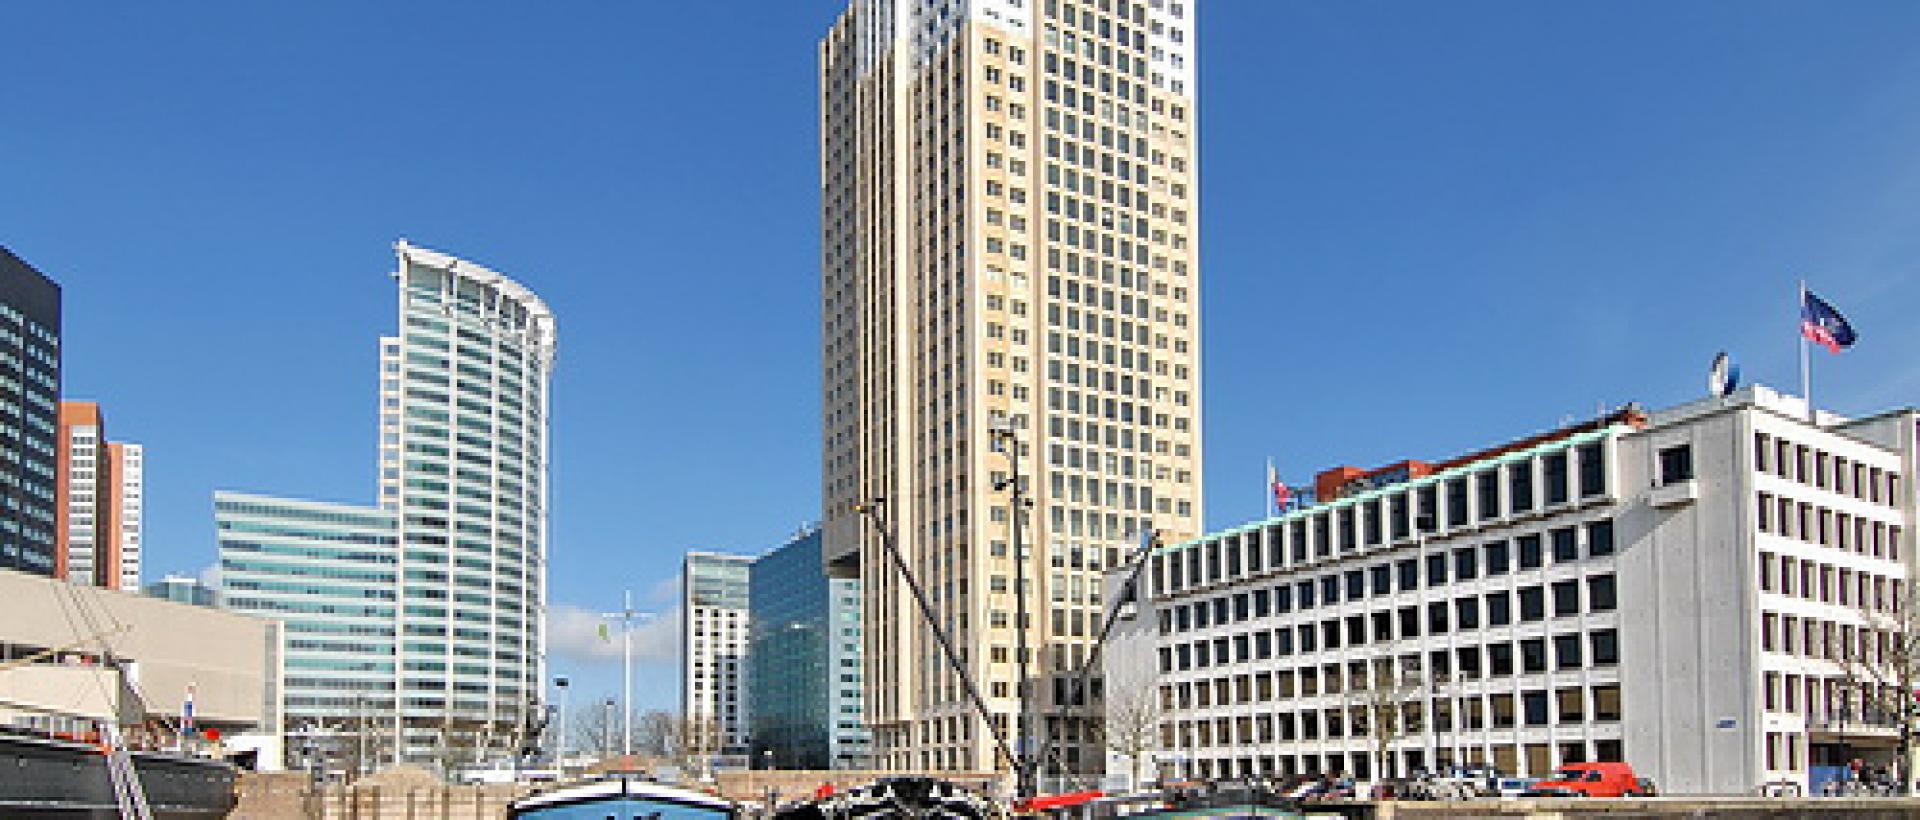 Blaak , Rotterdam, City Center, Zuid Holland   Rentals Rotterdam, Luxury  Furnished Apartments And Houses For Rent » Rotterdam Apartments And Houses